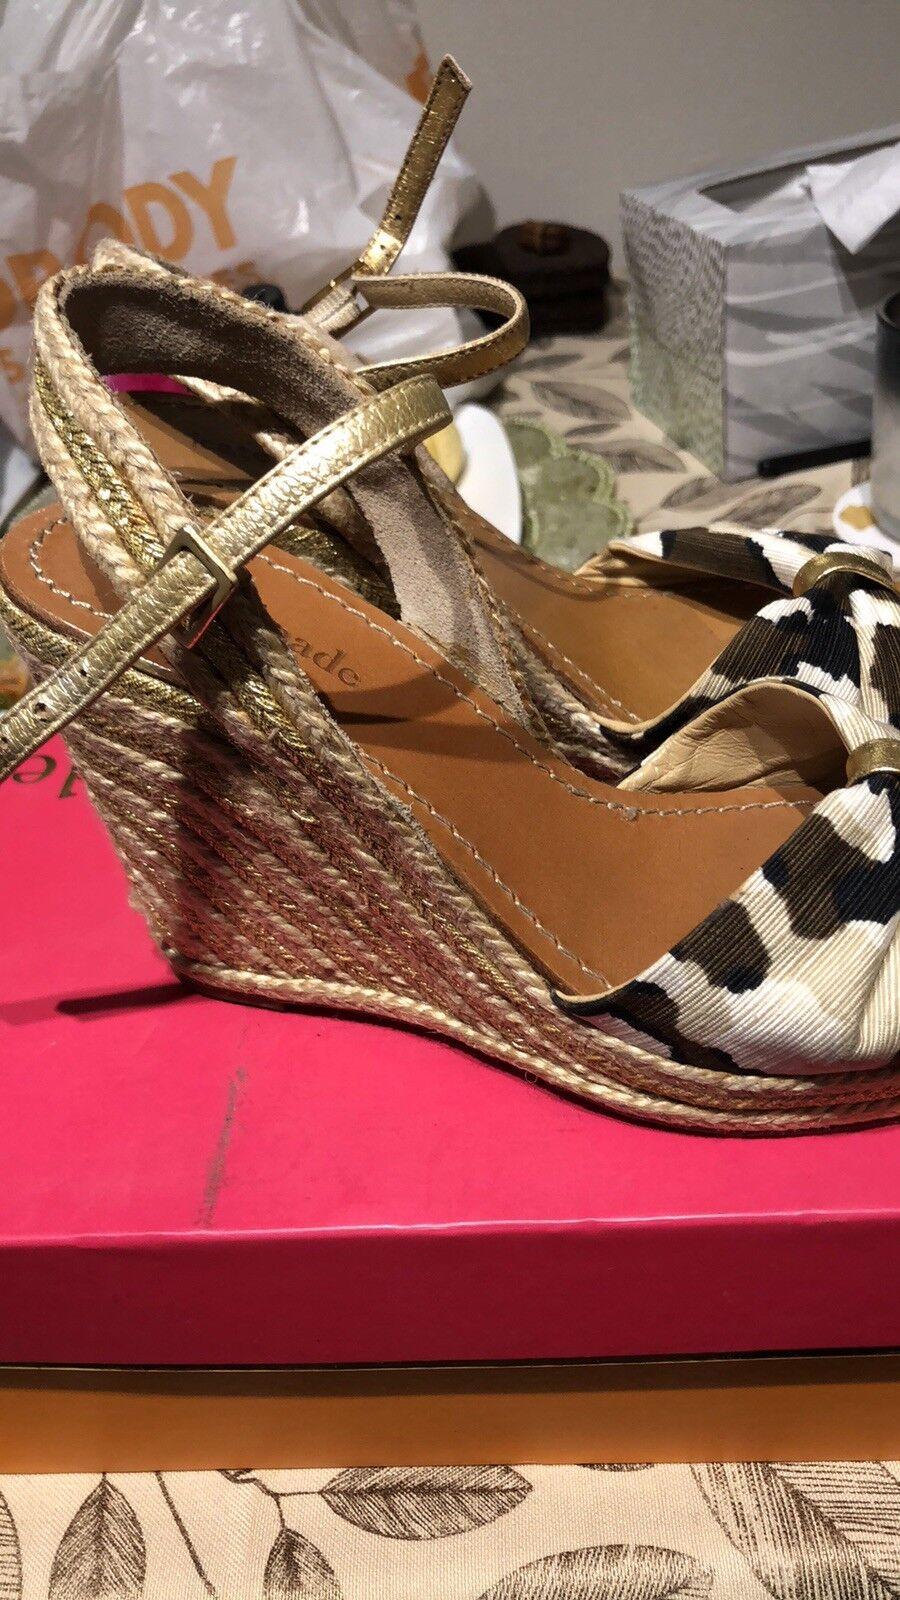 kate spade shoes 6 - image 4